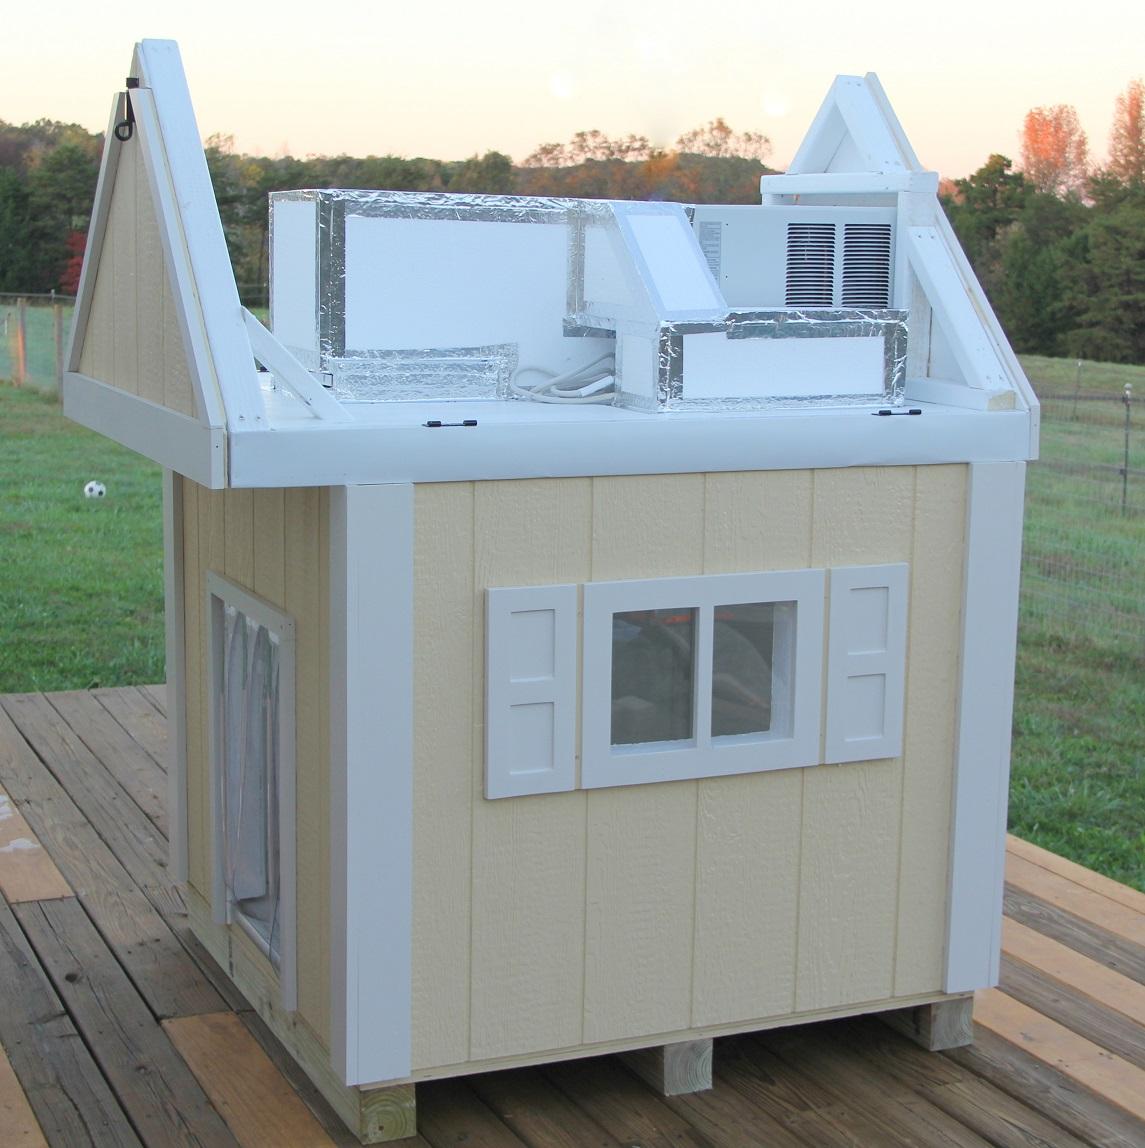 2016-11-16 - MERCHANTS dog house 3